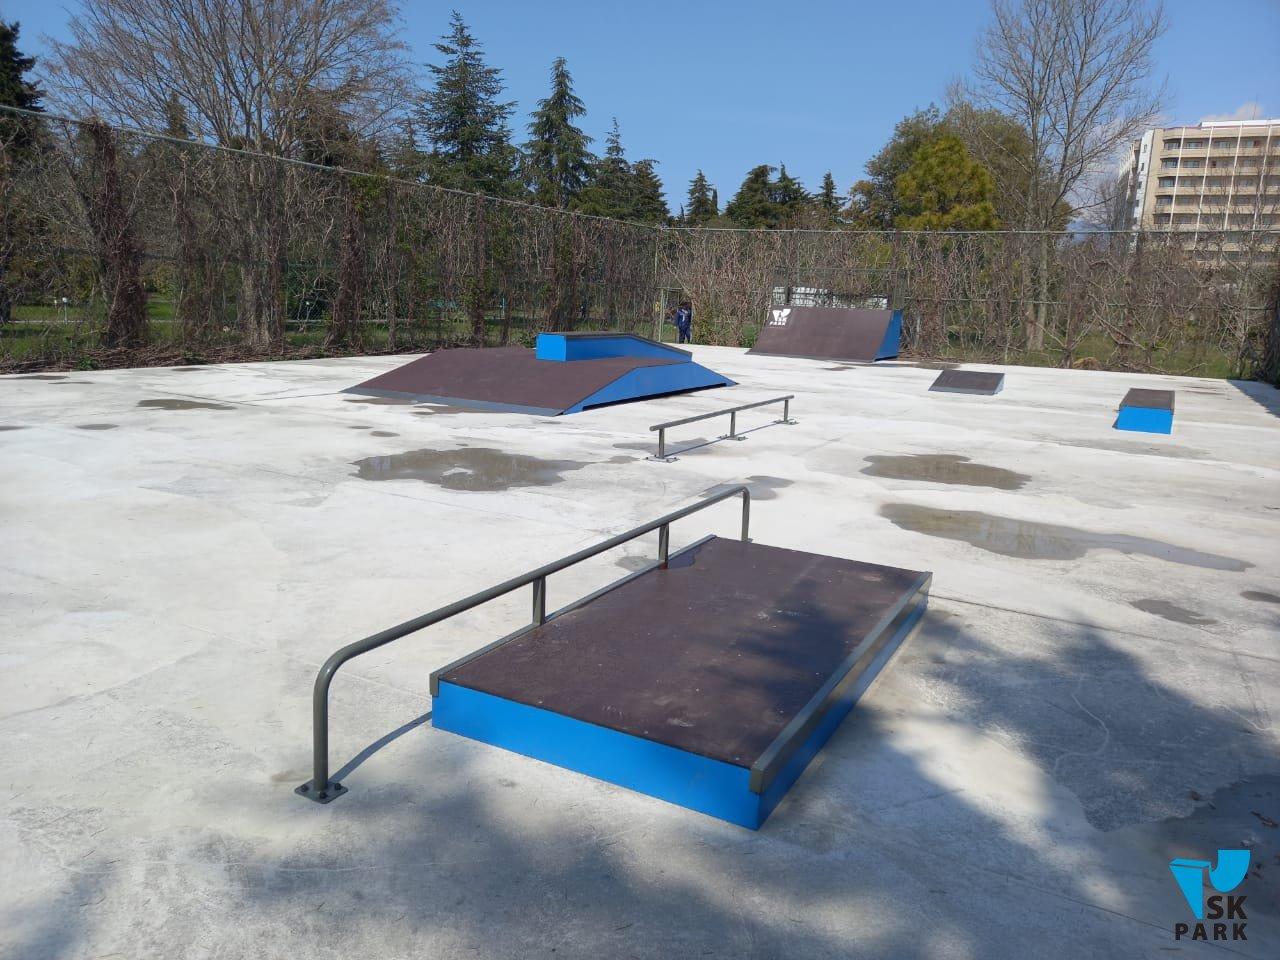 Новый каркасный скейт парк в г. Пицунда (республика Абхазия)